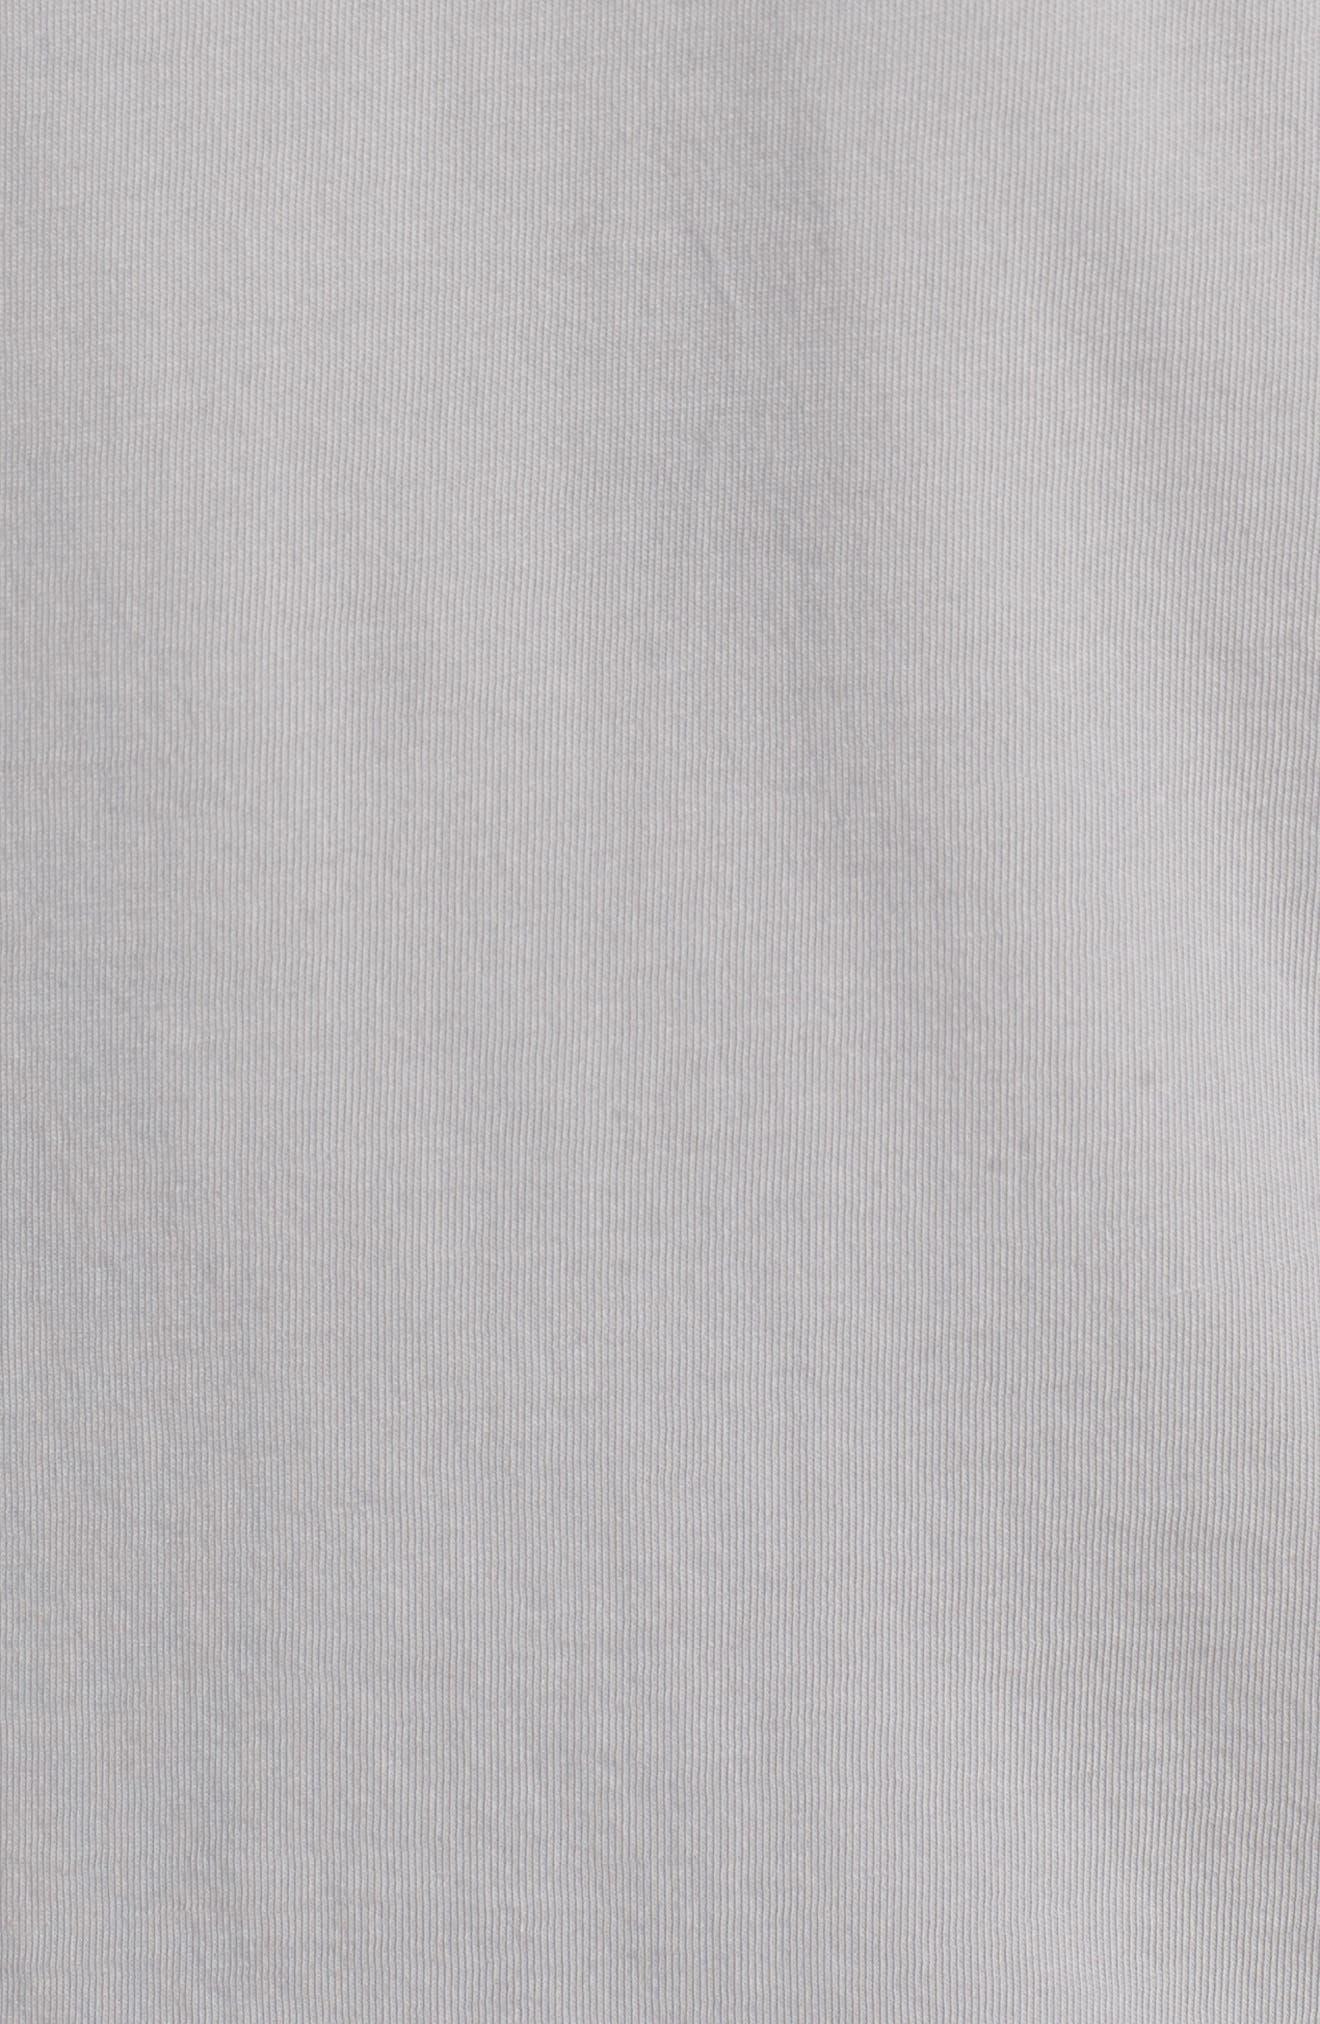 Anders Slim Fit Pocket T-Shirt,                             Alternate thumbnail 5, color,                             SUN FADED PEBBLE BEACH